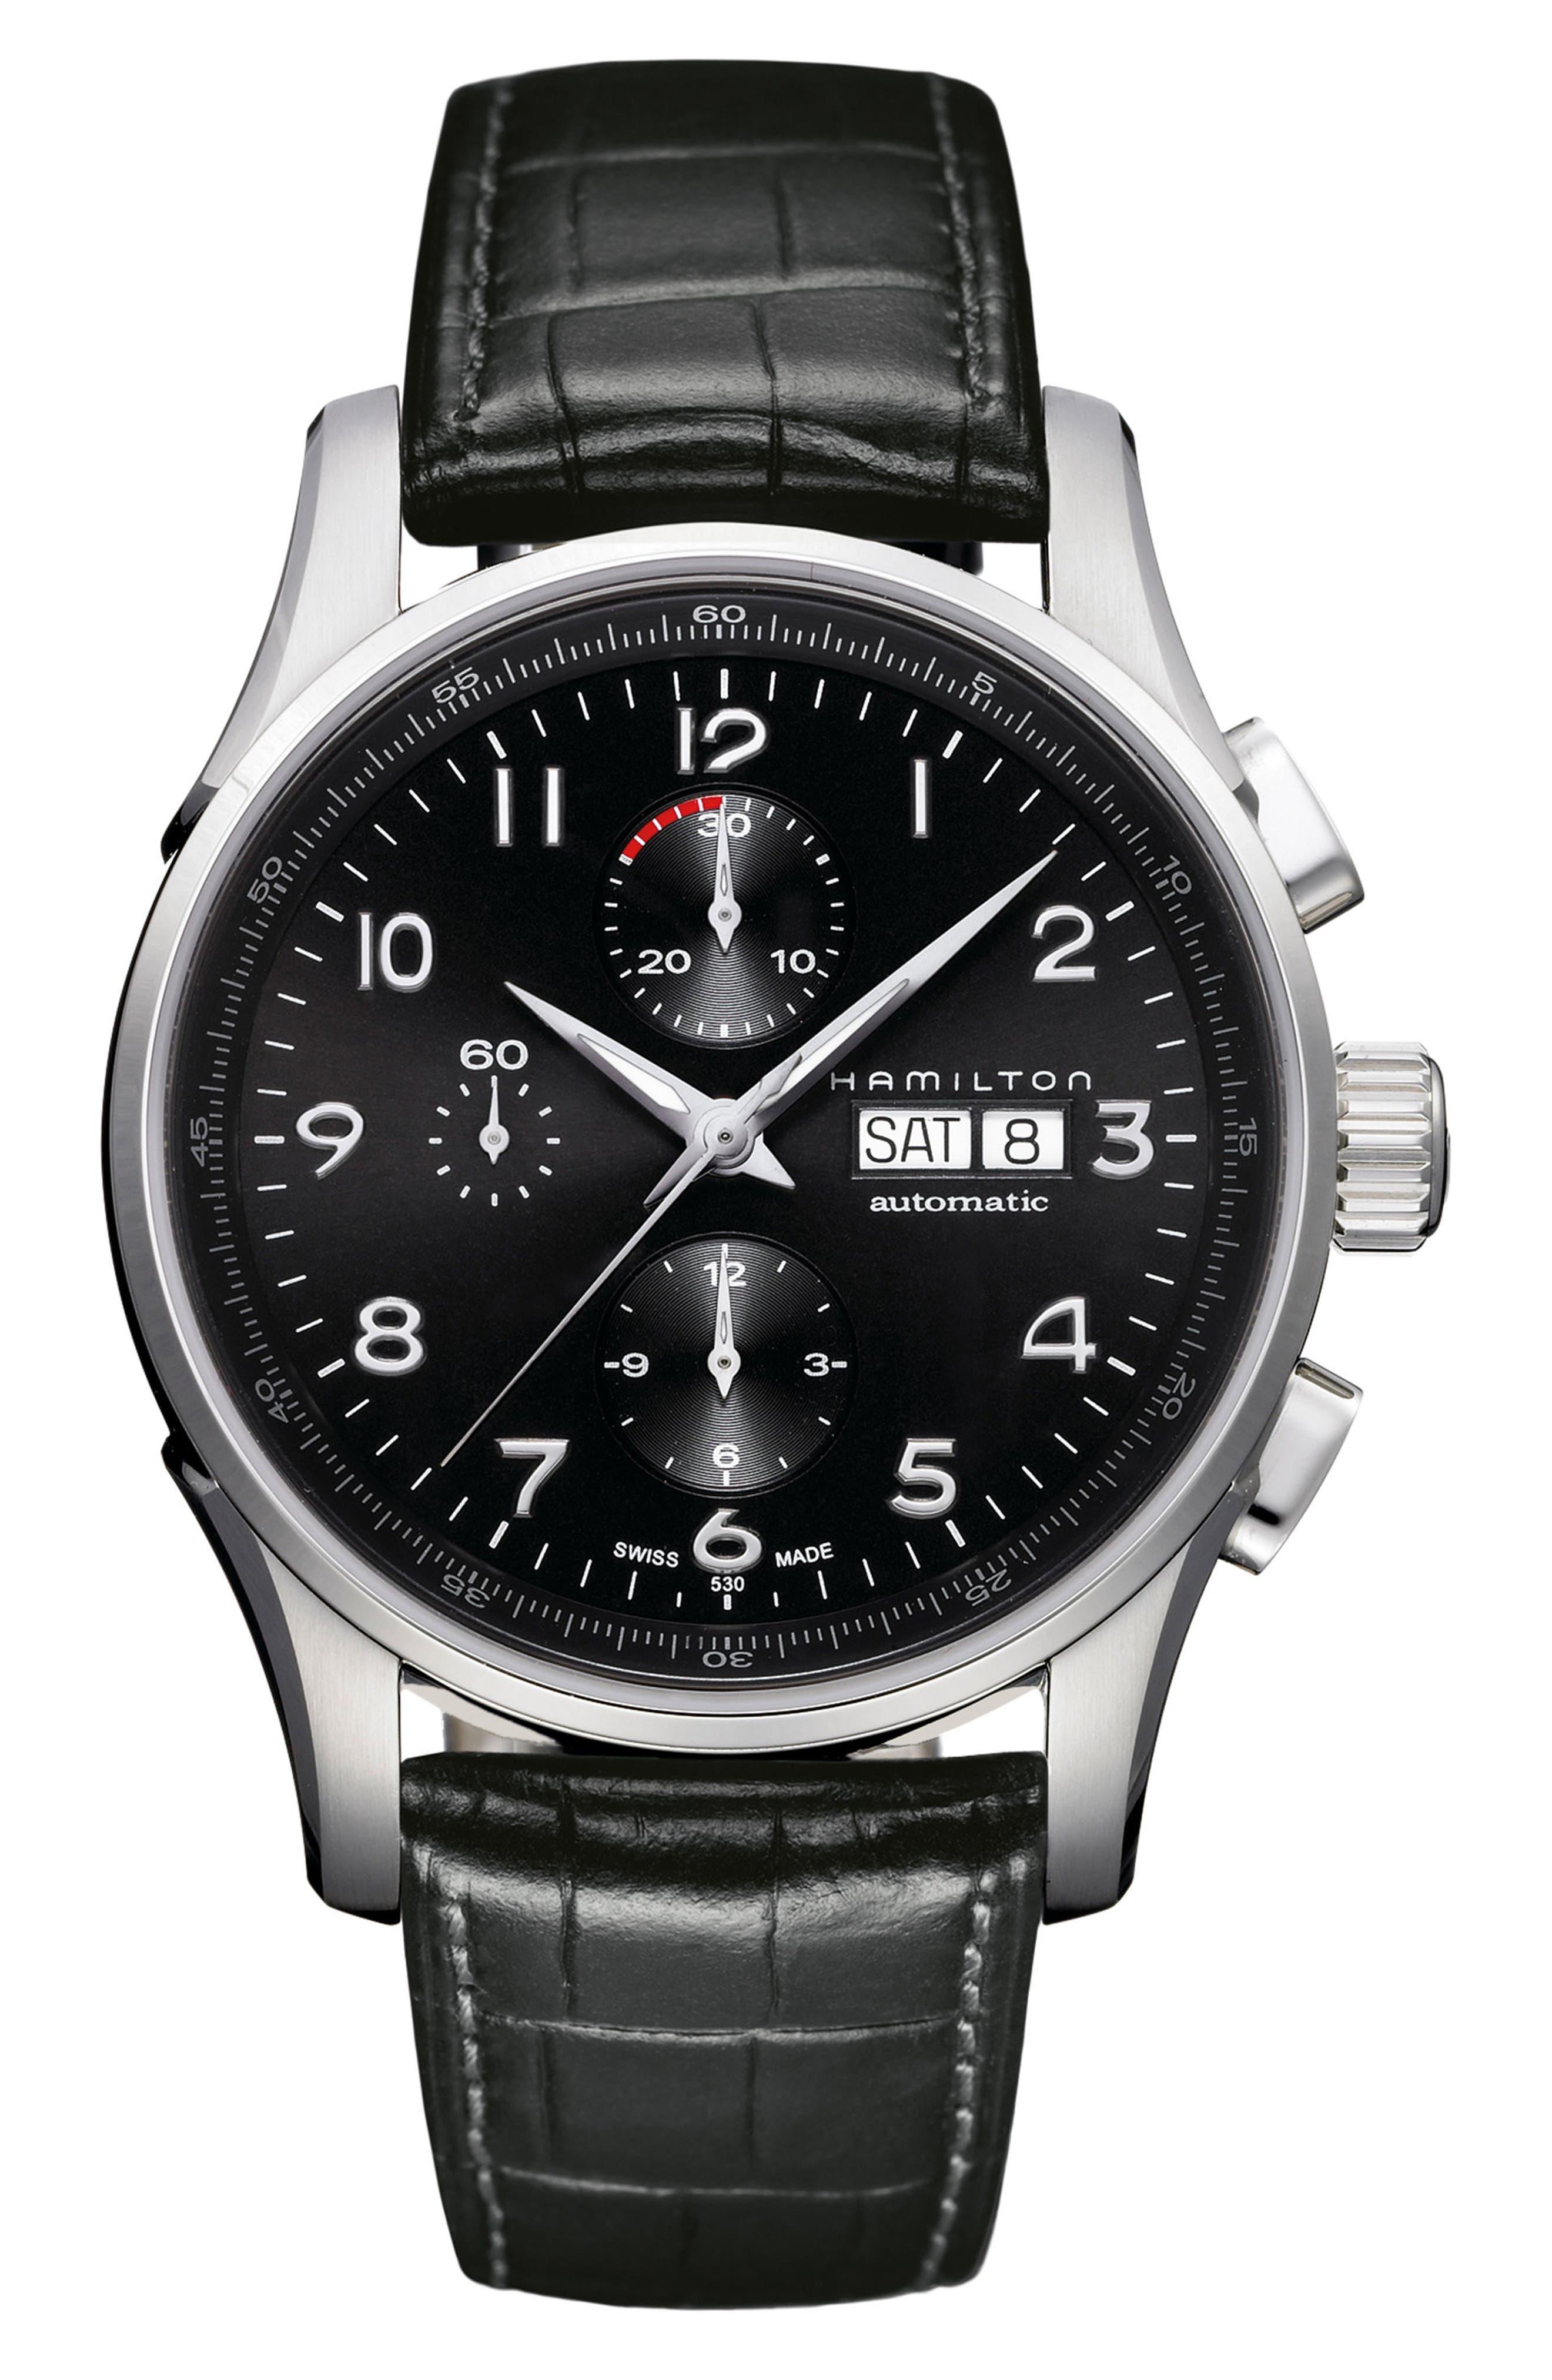 Main Image - Hamilton Jazzmaster Maestro Automatic Chronograph Leather Strap Watch, 45mm